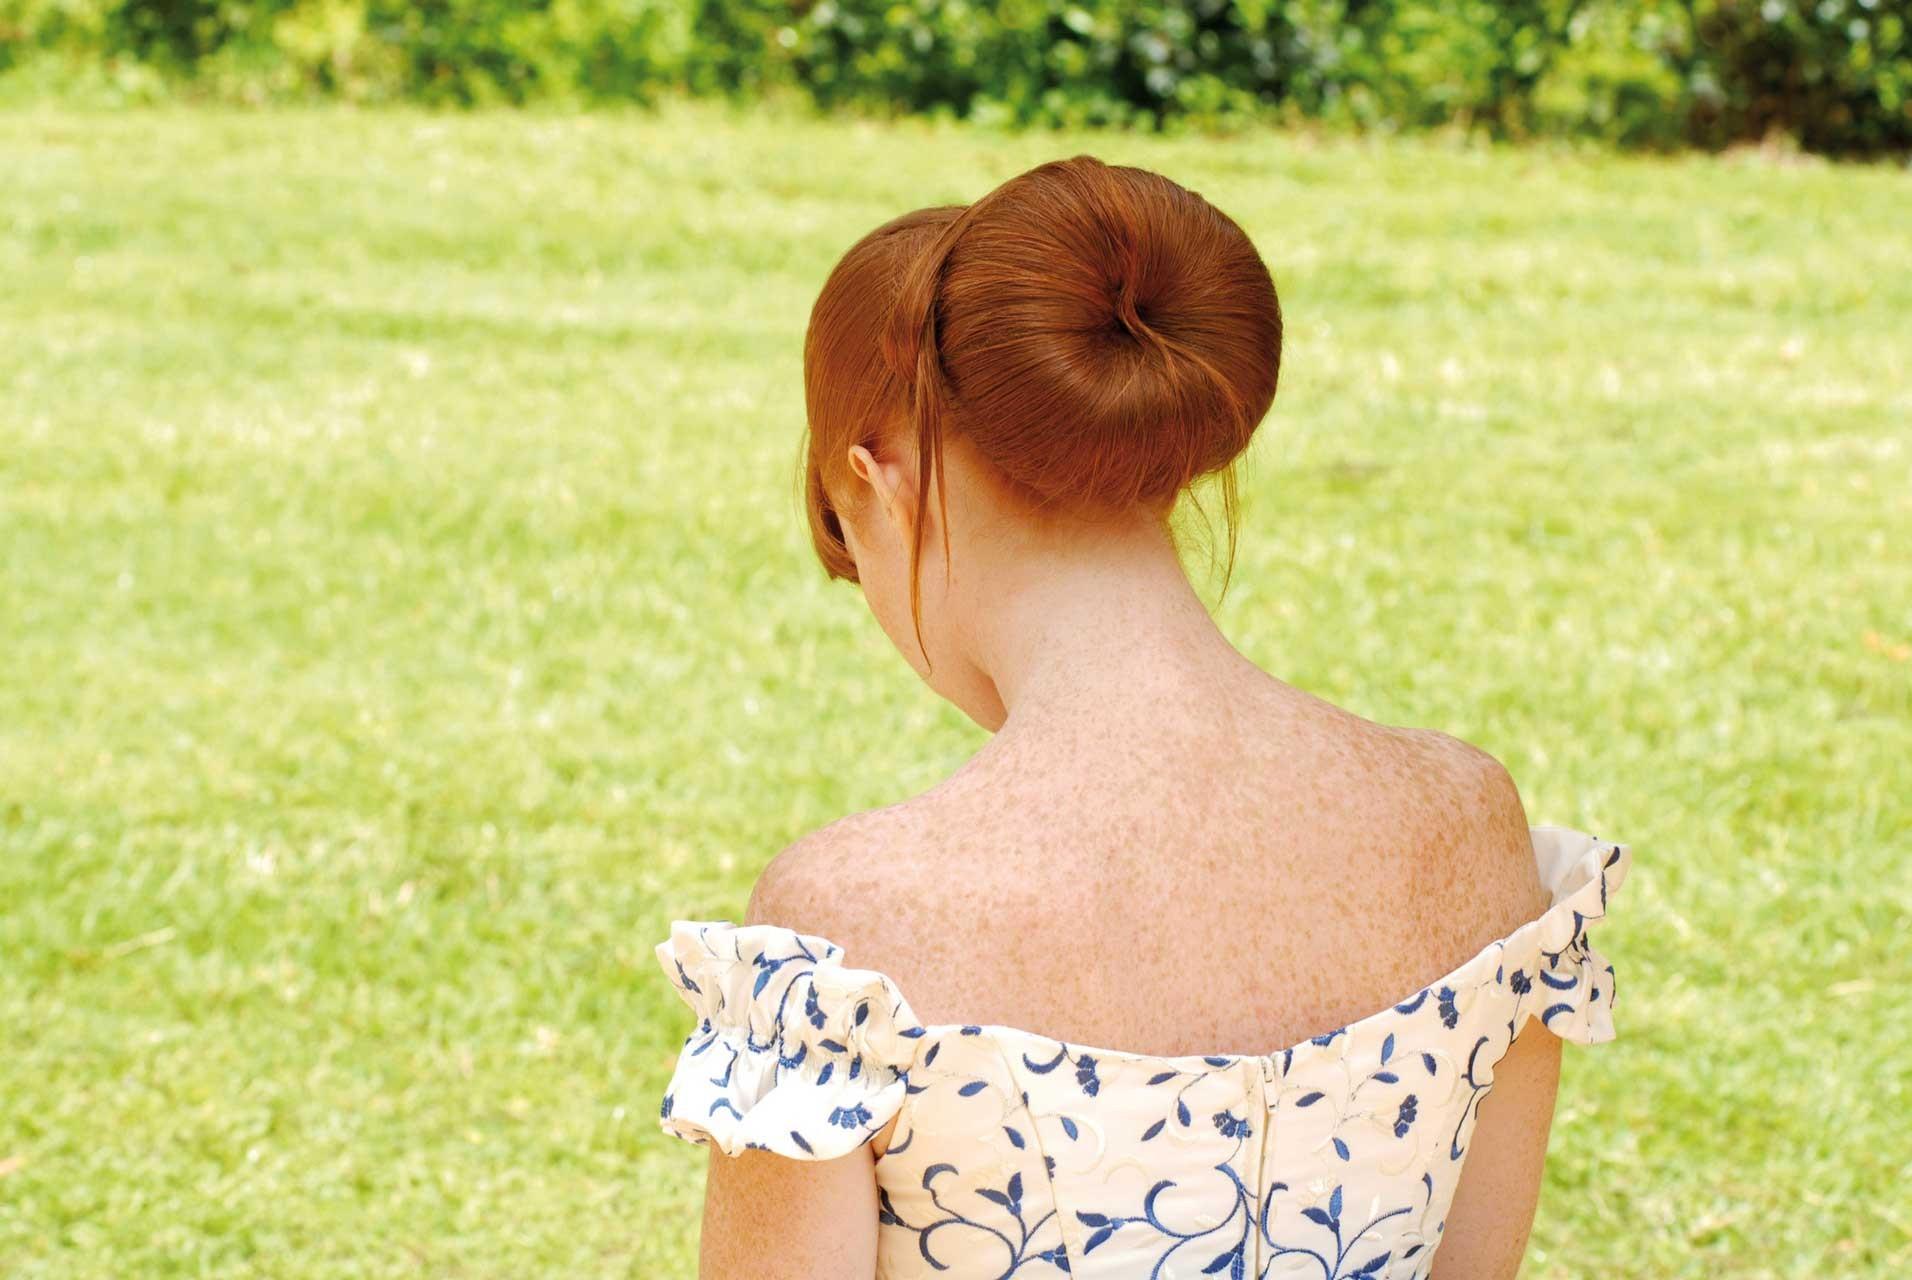 Laure-Maud_photographe_portrait_15_Pauline-1